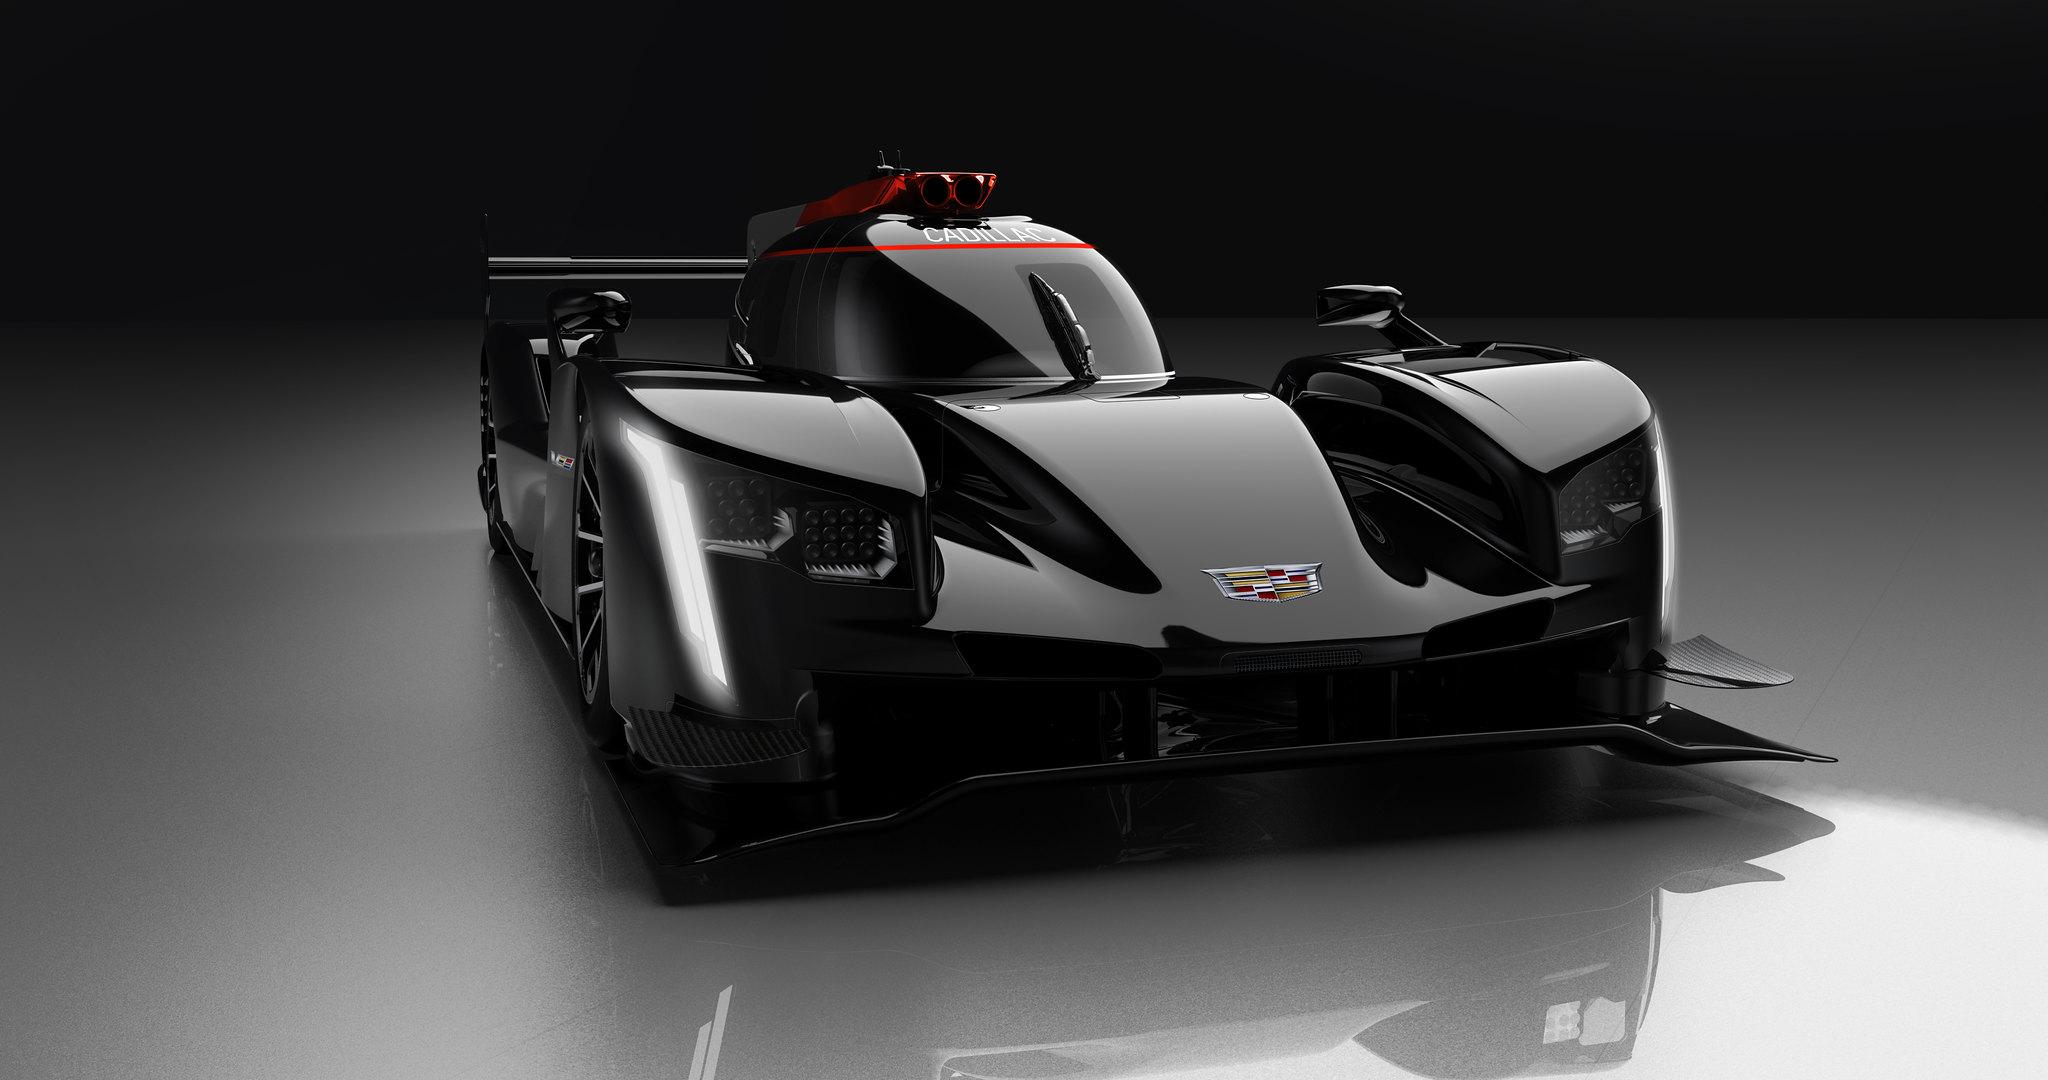 Cadillac Racing expands by reentering prototype endurance racing